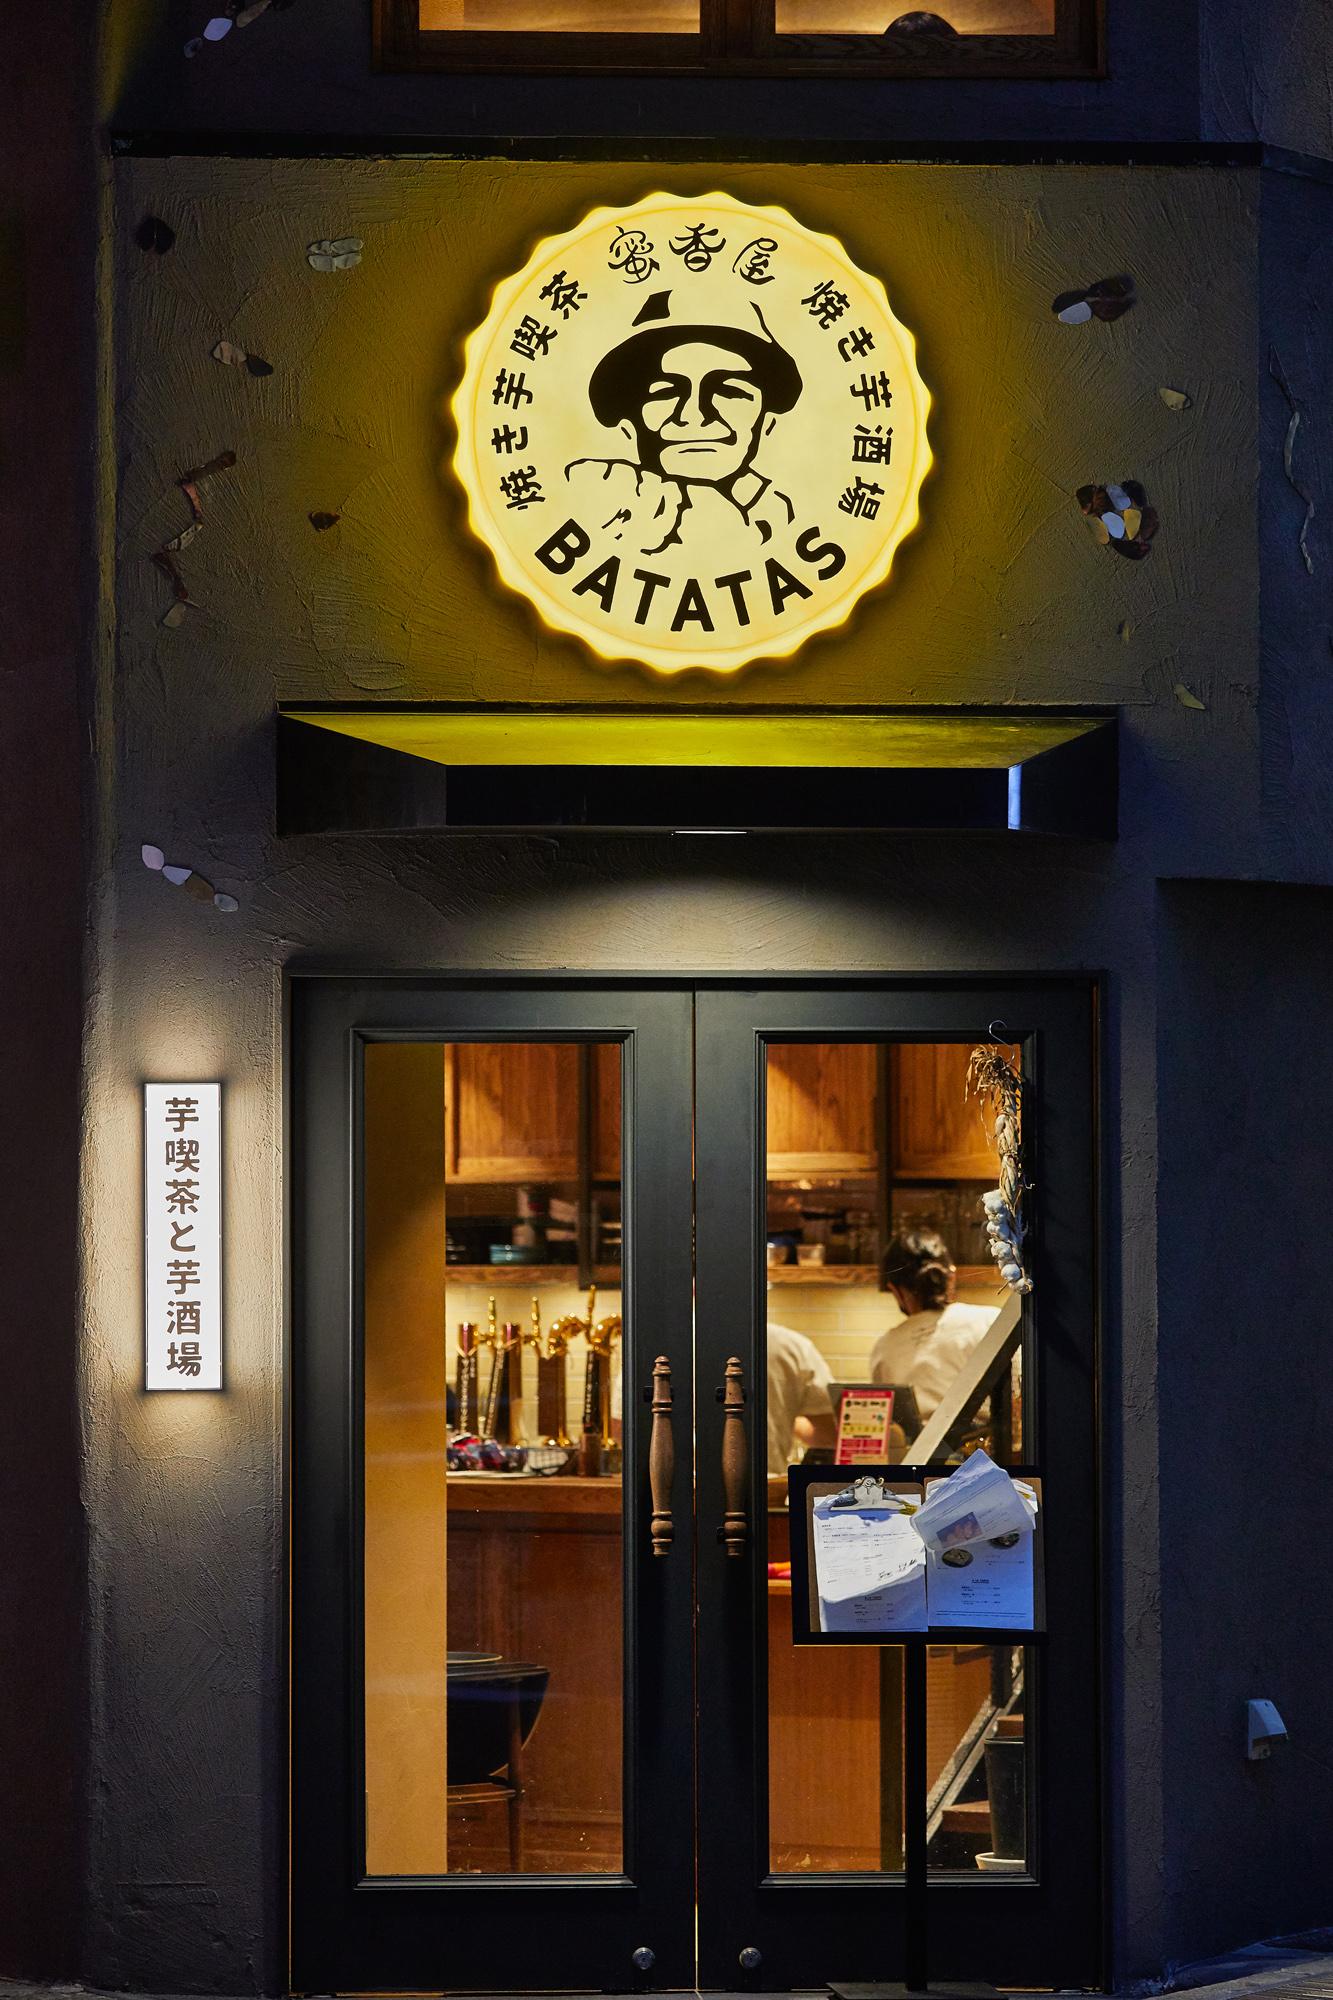 BATATAS 蜜香屋 ロゴの実績写真